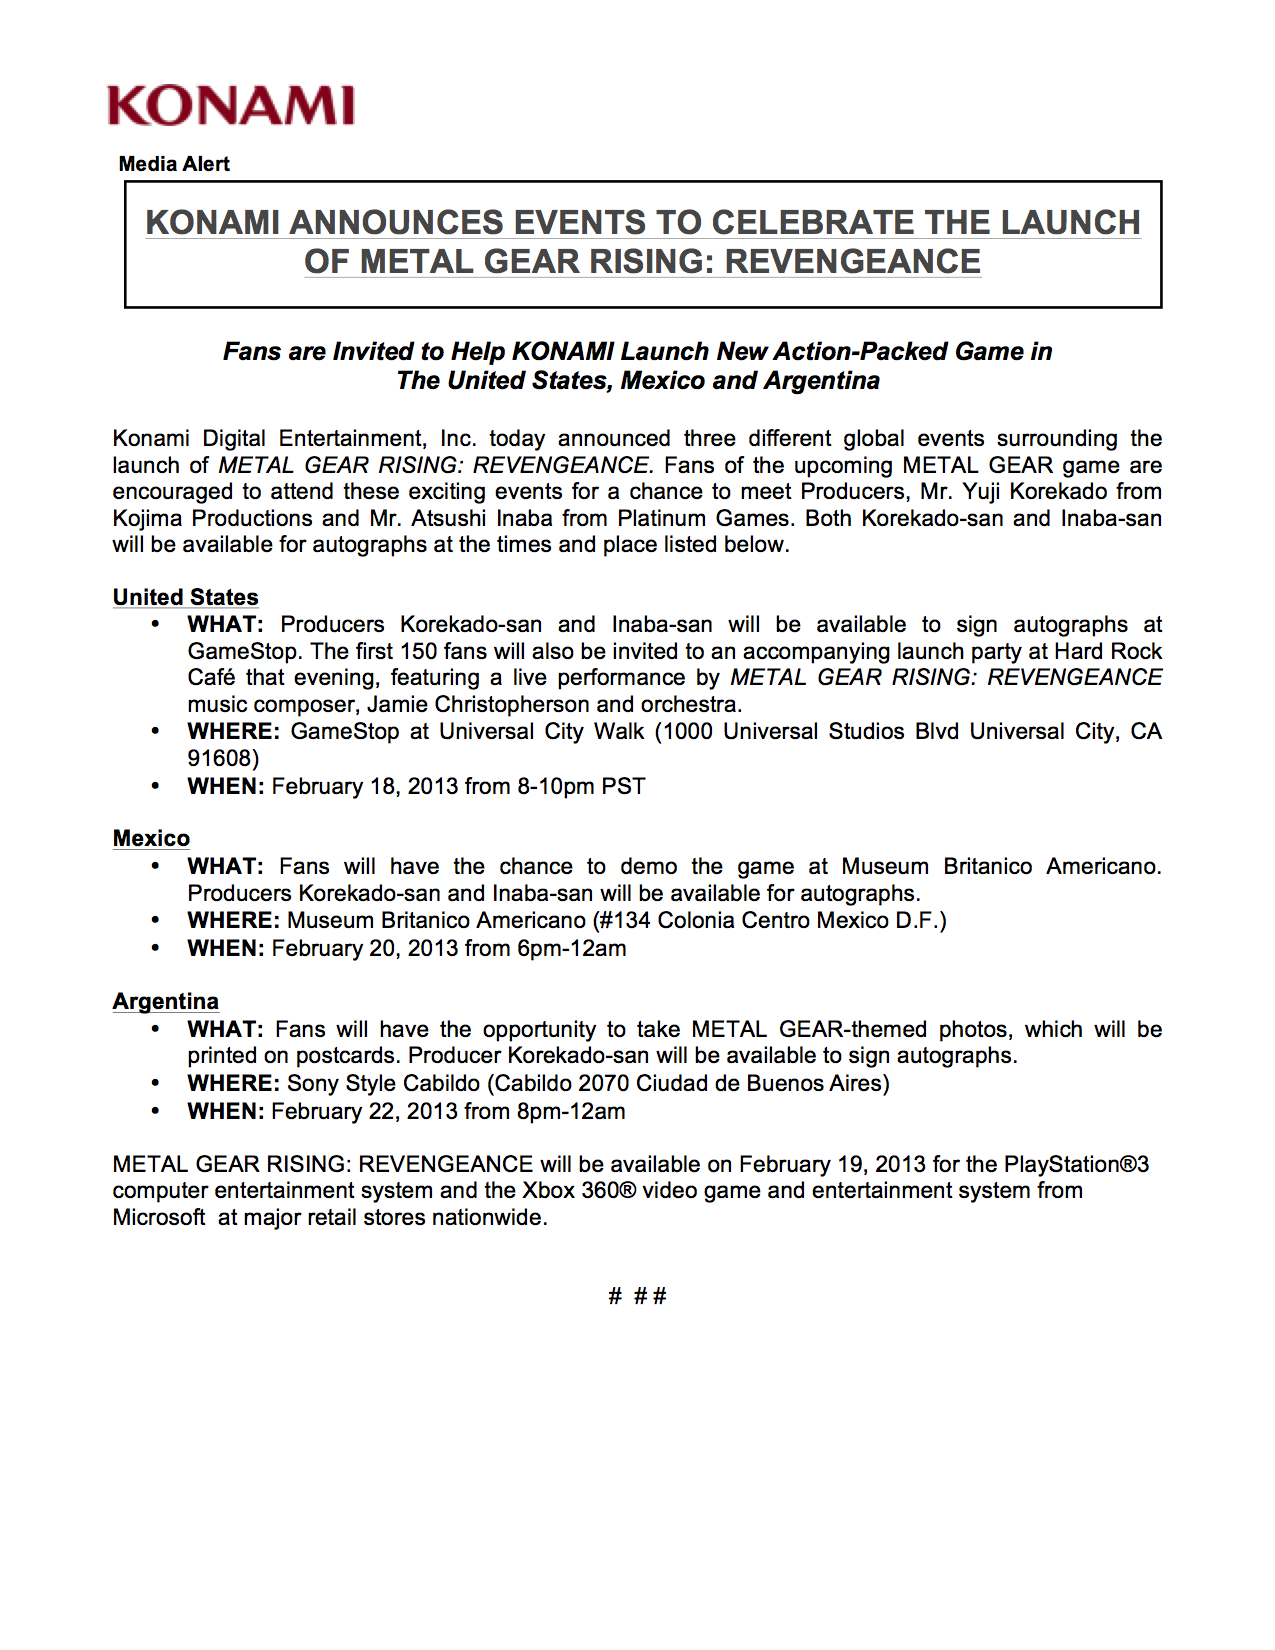 MGR Launch Event Media Alert_FINAL